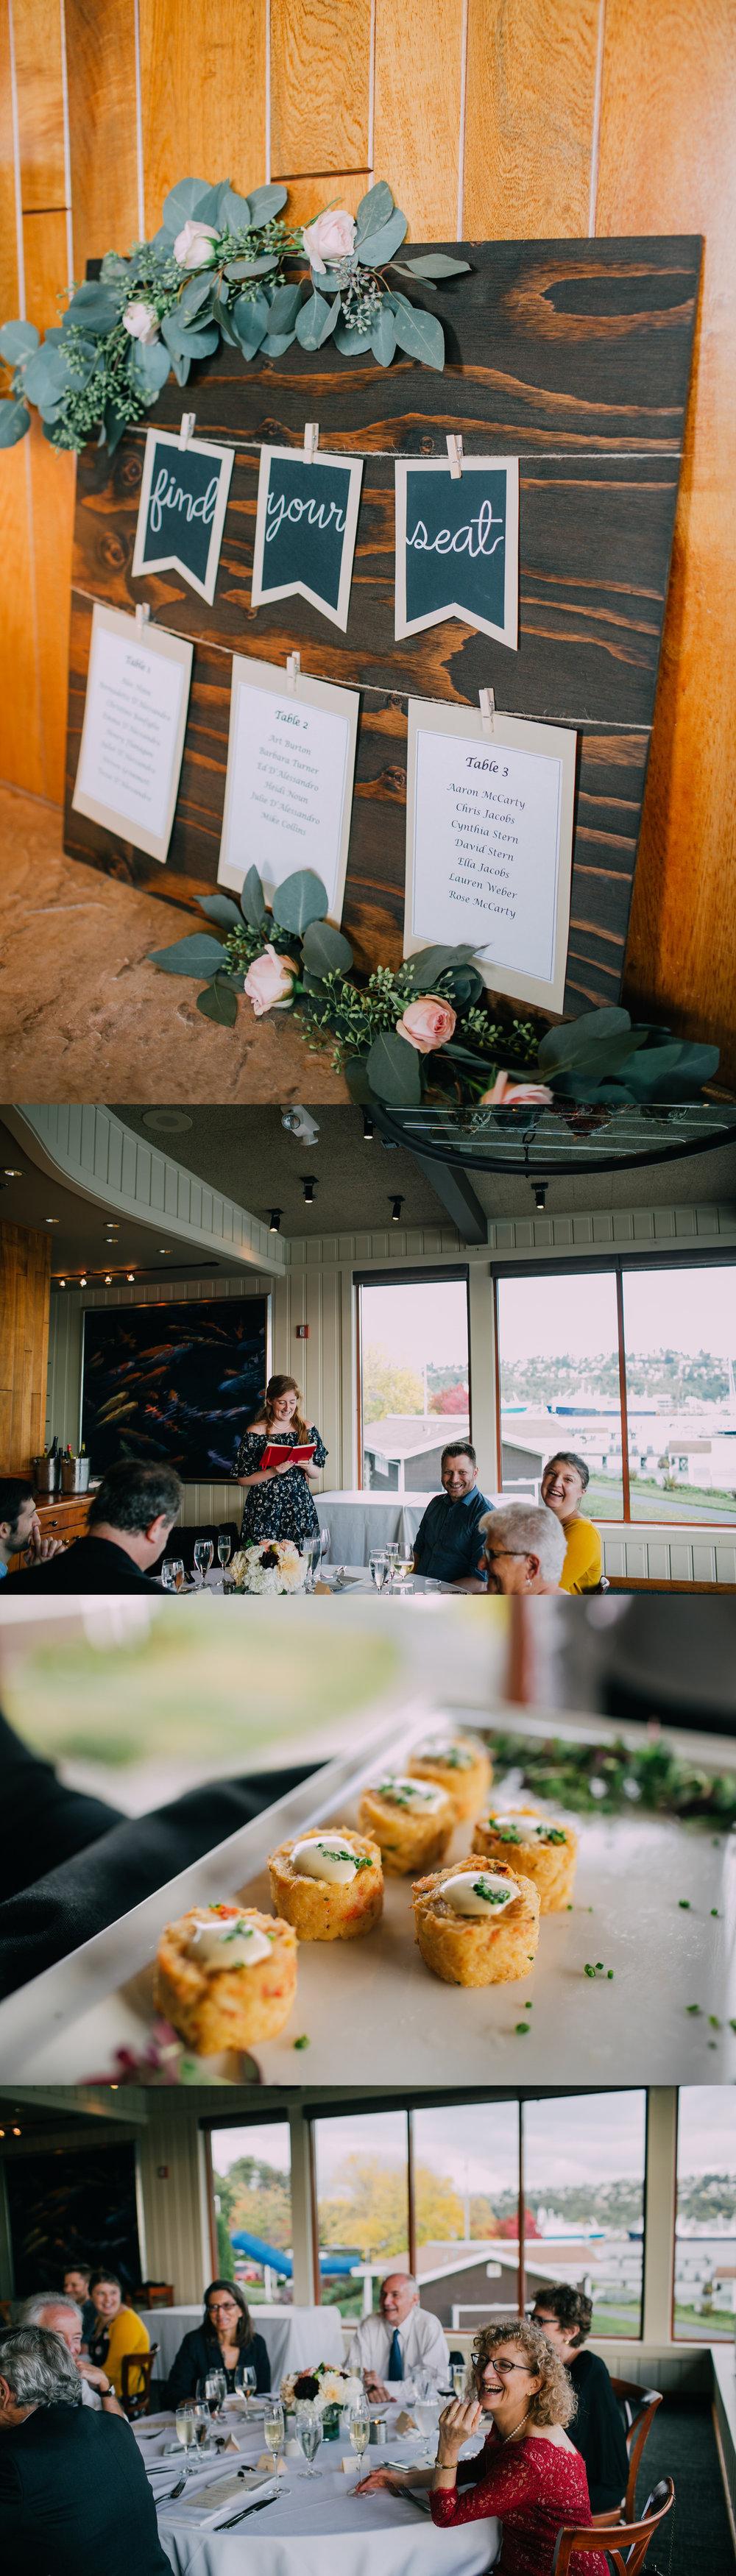 intimate small wedding photographer seattle washington pnw restaurant reception -2.jpg